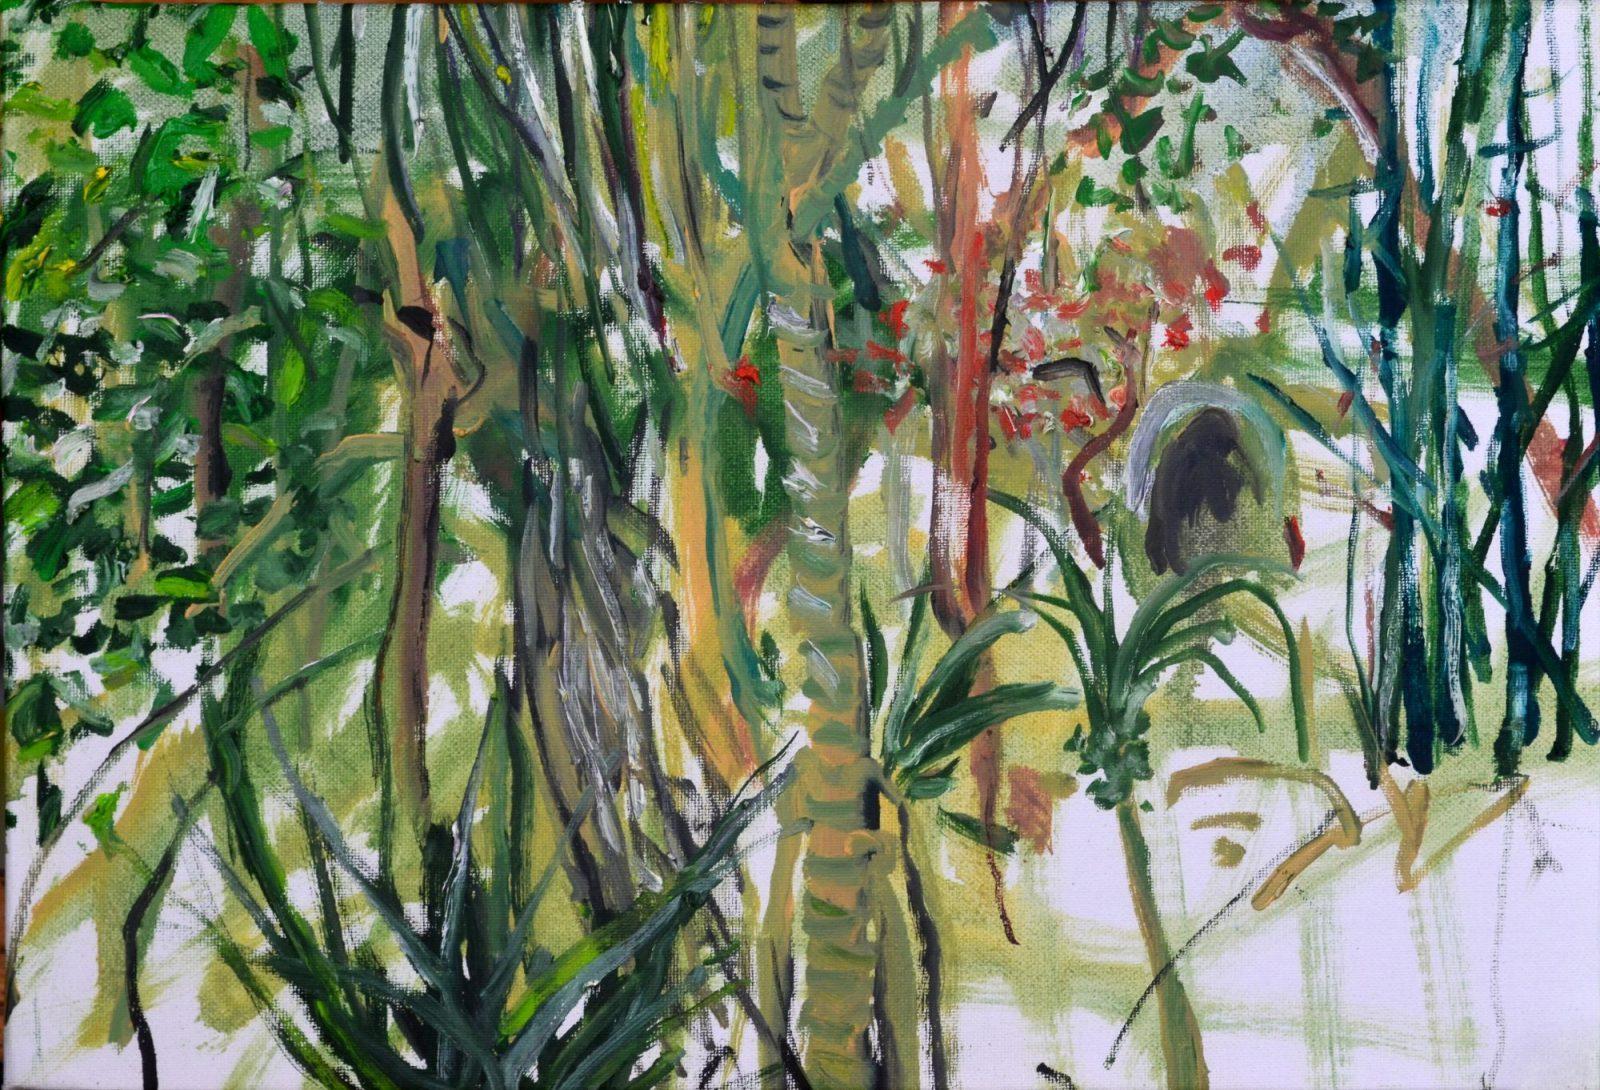 franyo aatoth: Garden Series 31.